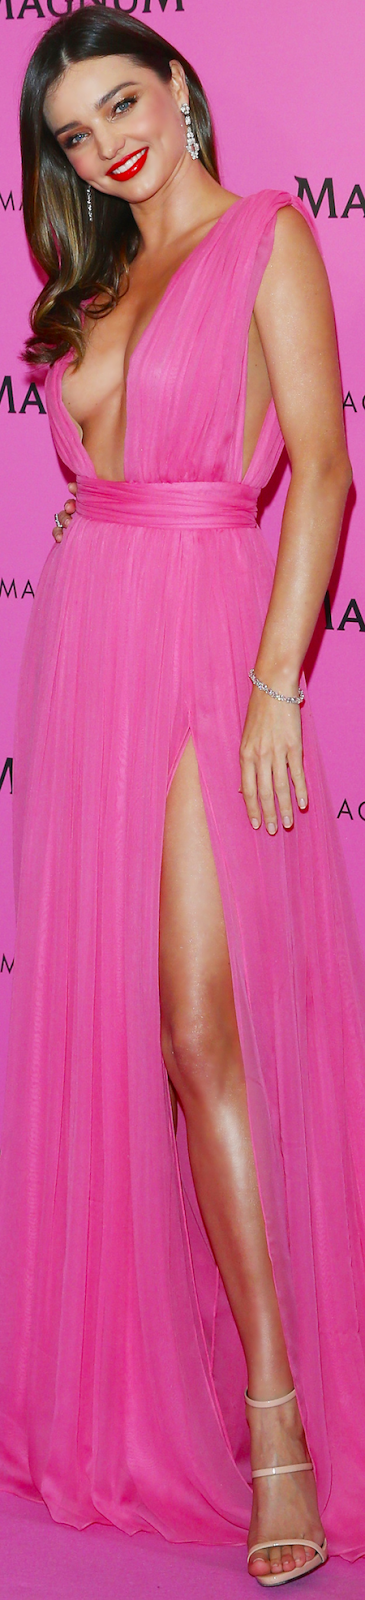 Miranda Kerr Cannes Film Festival